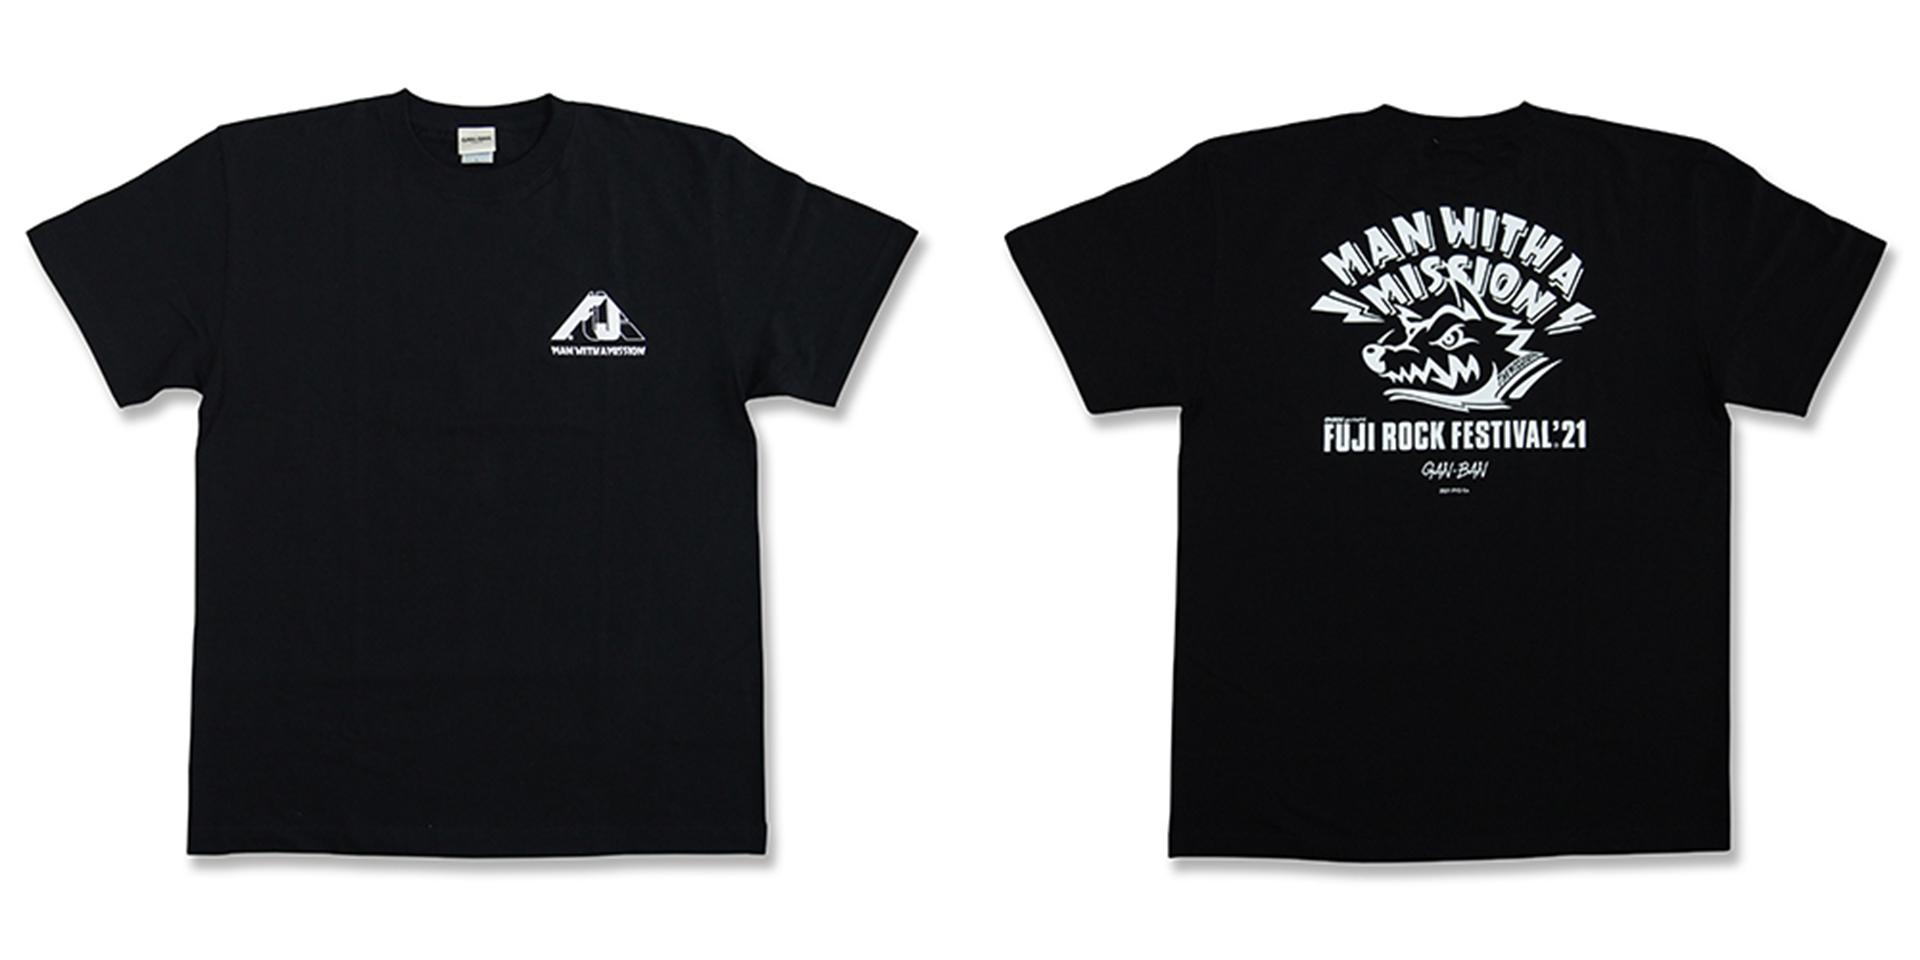 fujirock-2021-lineup03_03 フジロック第三弾にザ・クロマニヨンズ、DYGLら!未発表Tシャツの情報も #fujirock